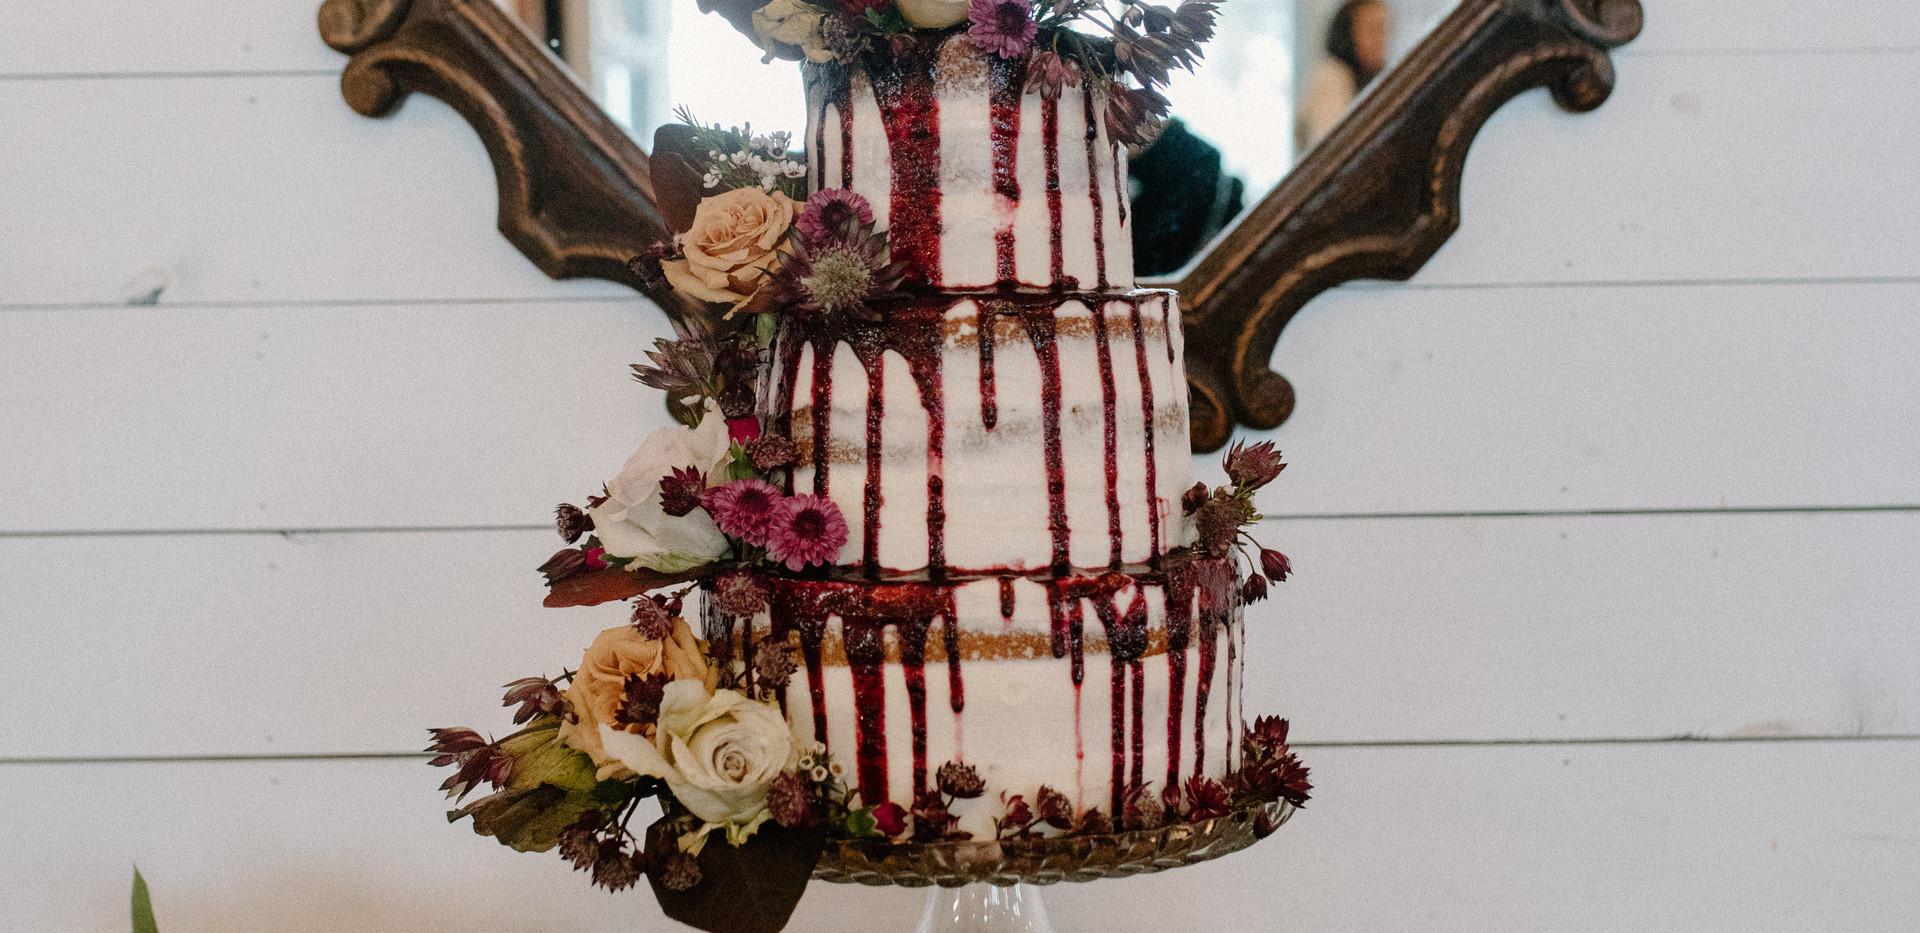 cake1.jpg